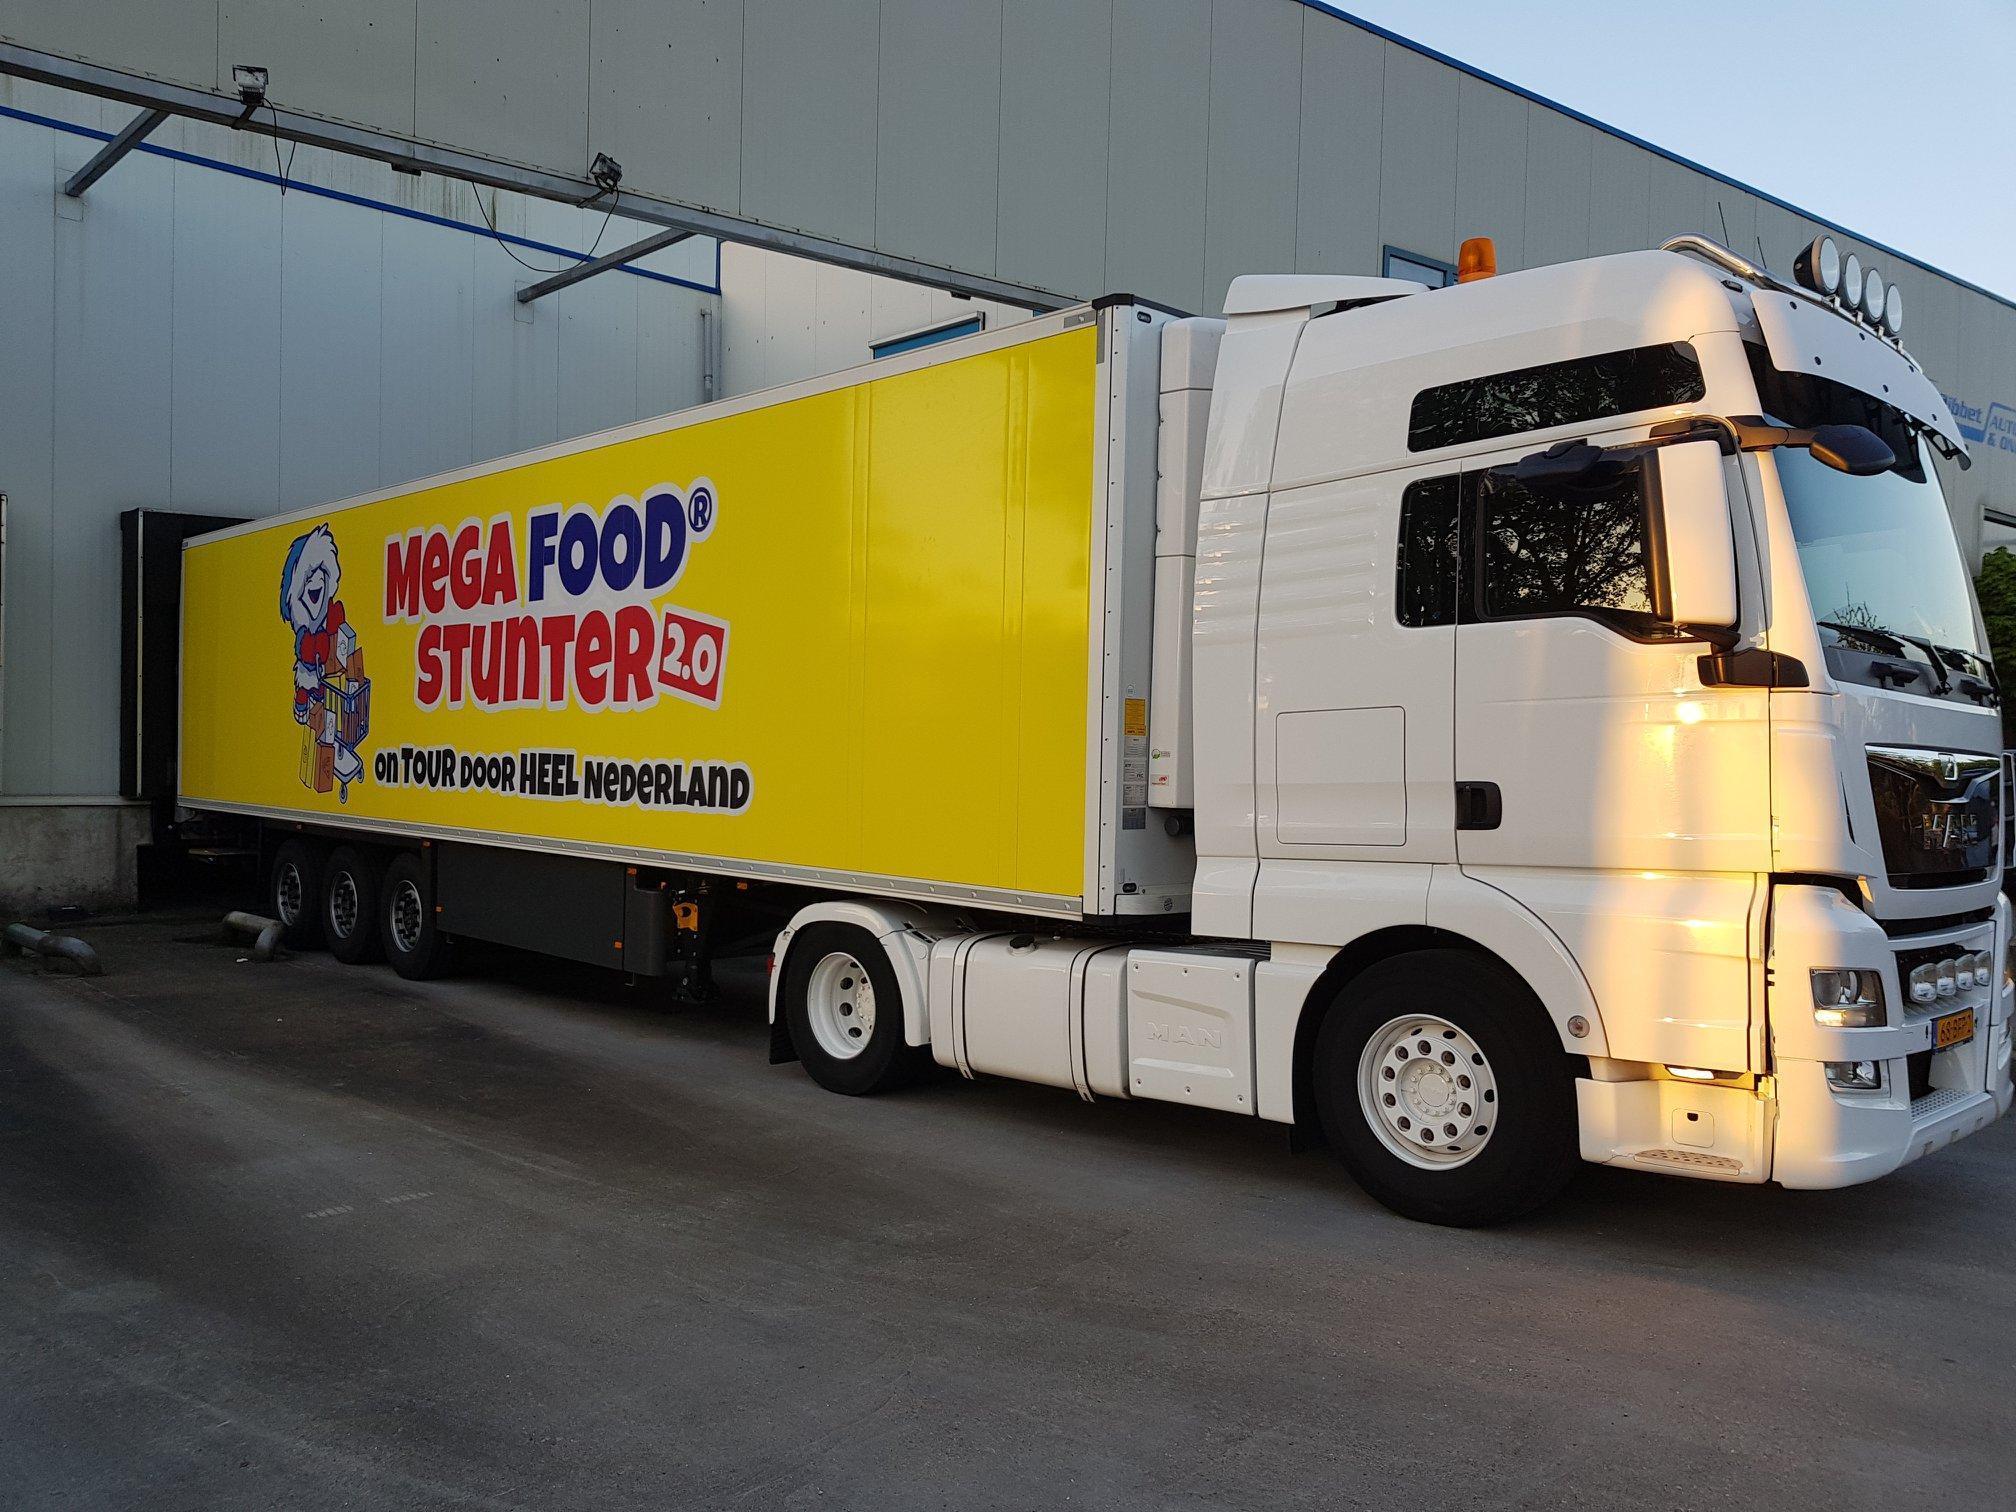 Goedkope Badkamer Assen : Megafoodstunter2.0 truck dinsdag weer in assen assenstad.nl